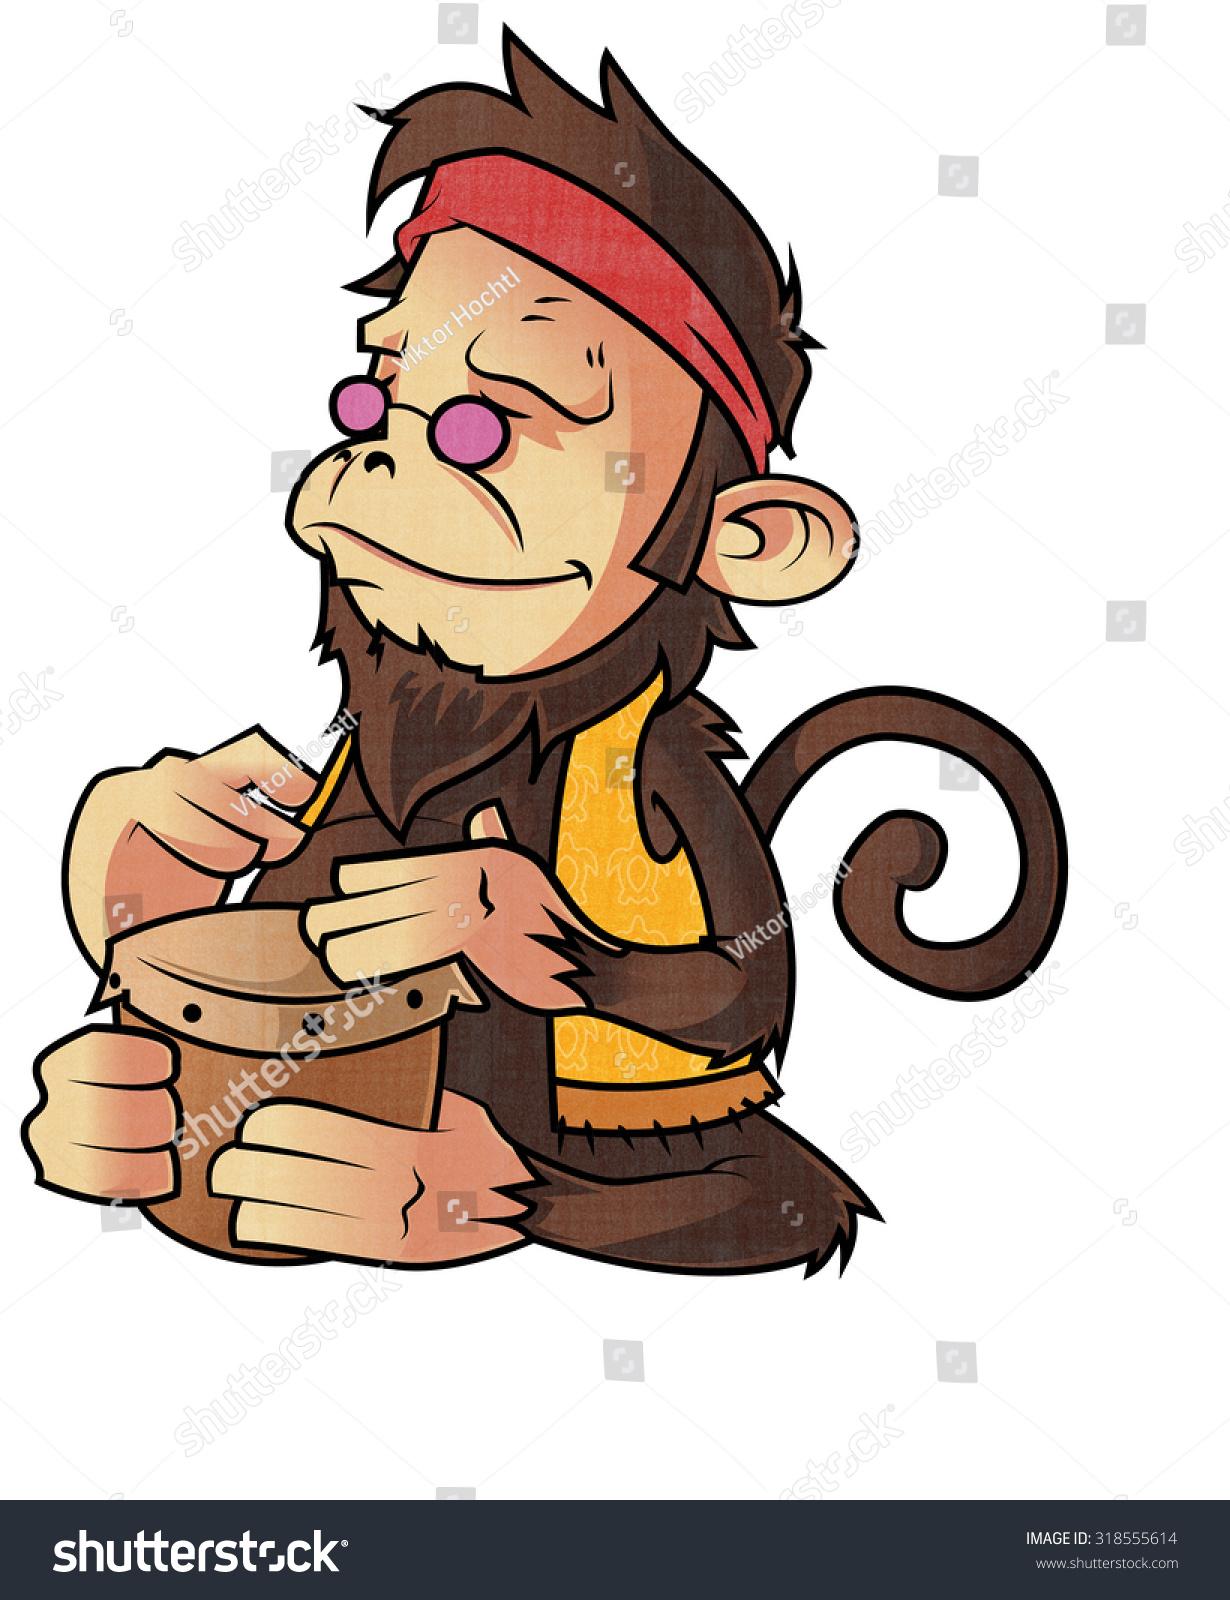 Royalty Free Stock Illustration Of Hippie Monkey Playing Bongo Drums